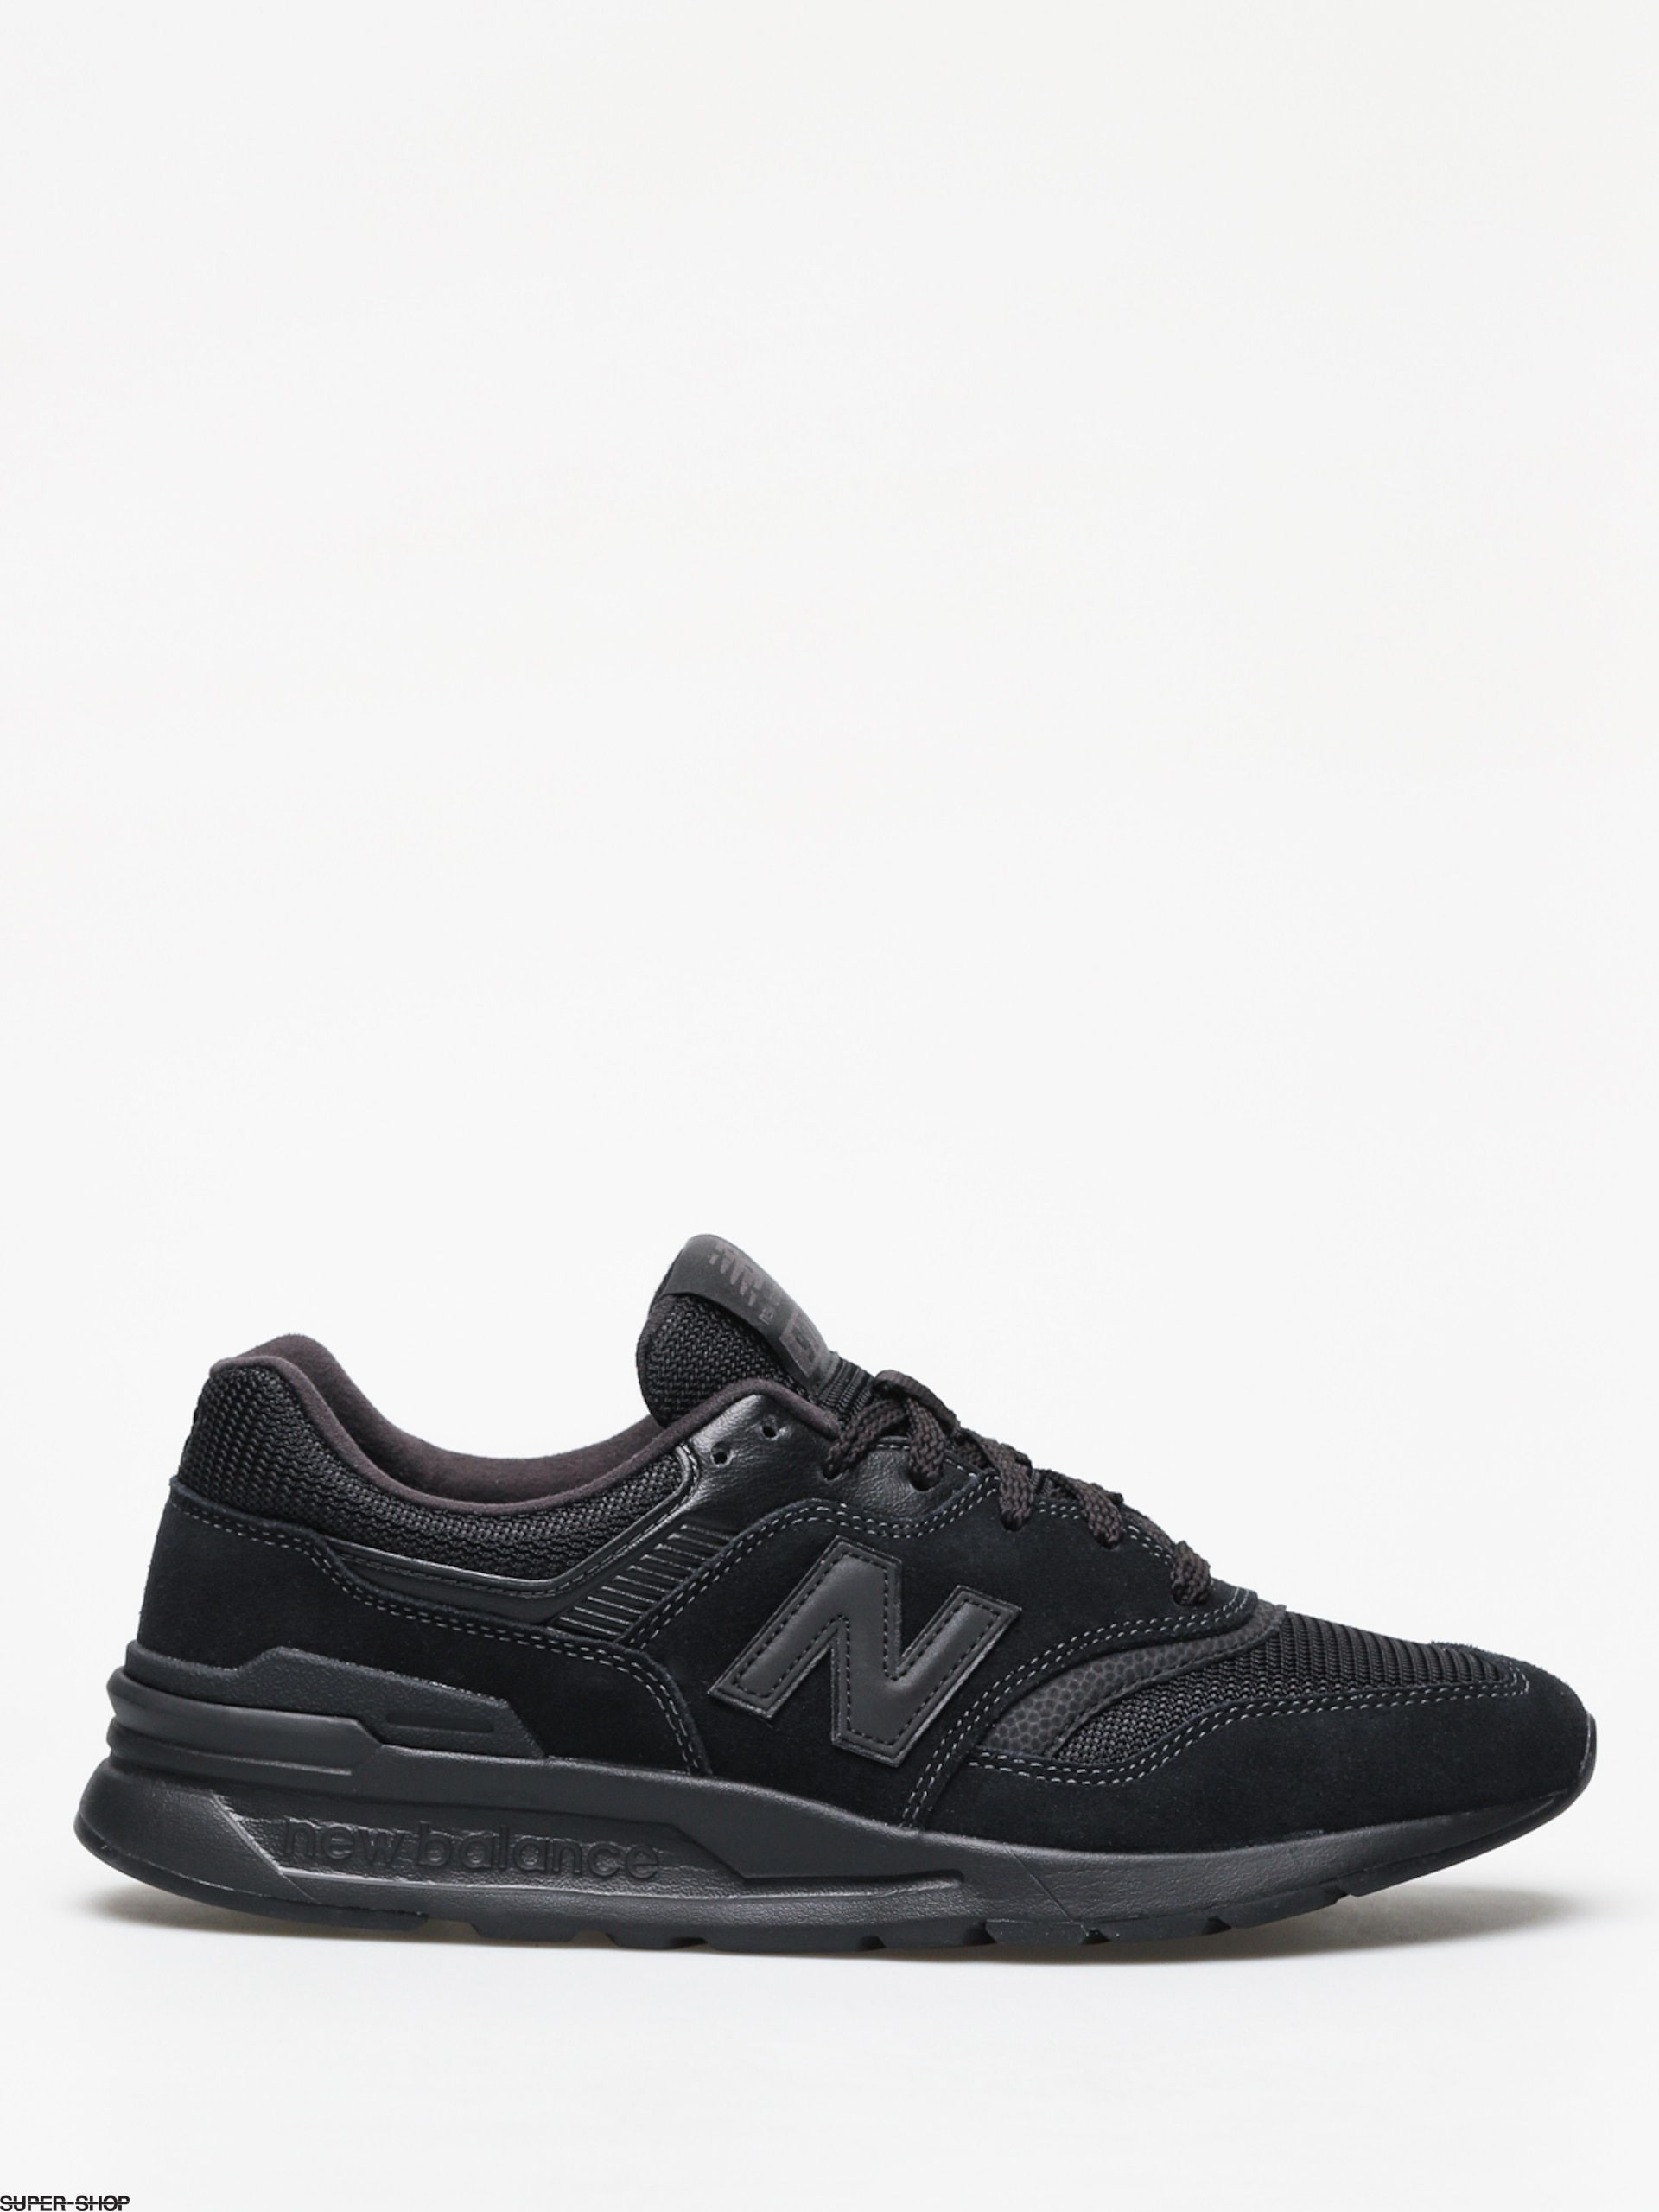 official photos 054d5 50e4b New Balance 997 Shoes (black)